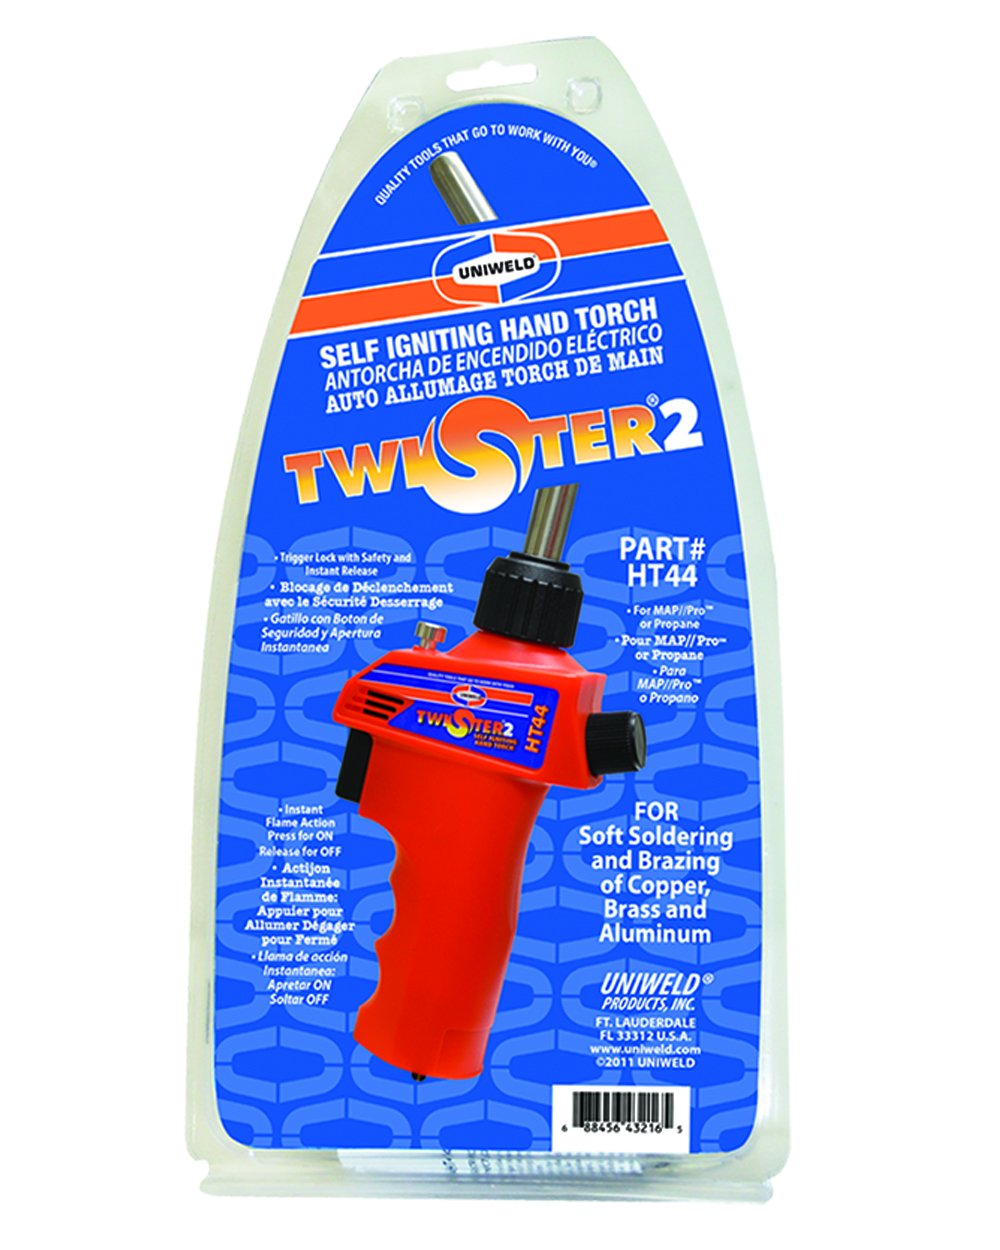 Uniweld HT44 Twister 2 Self Ingiting Hand Torch